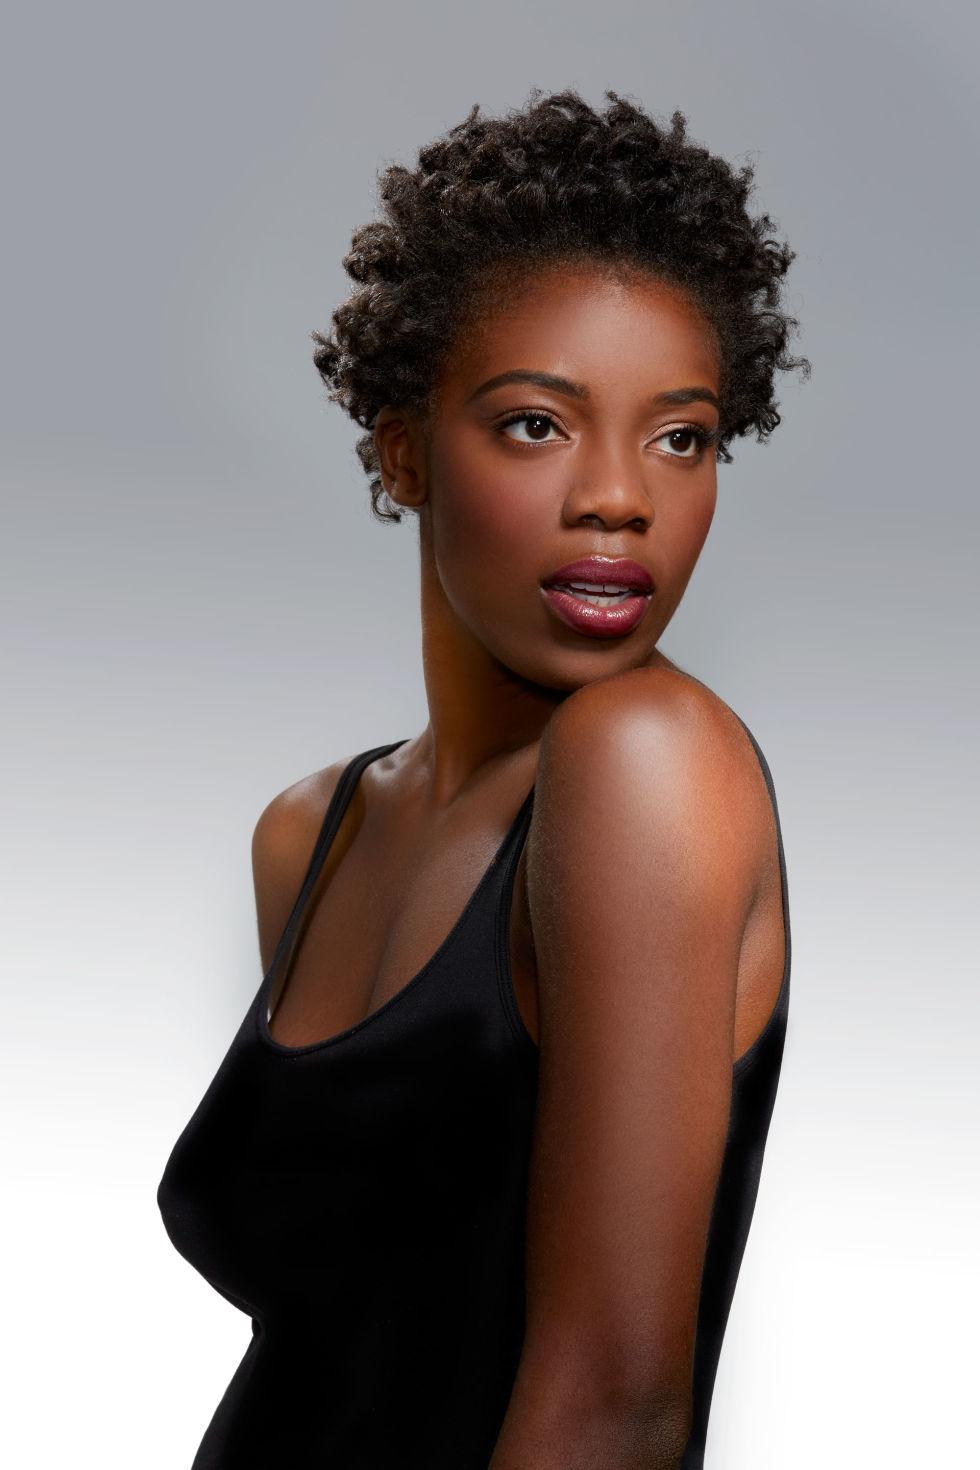 Superb 29 Black Hairstyles Best African American Hairstyles Amp Haircuts Short Hairstyles For Black Women Fulllsitofus